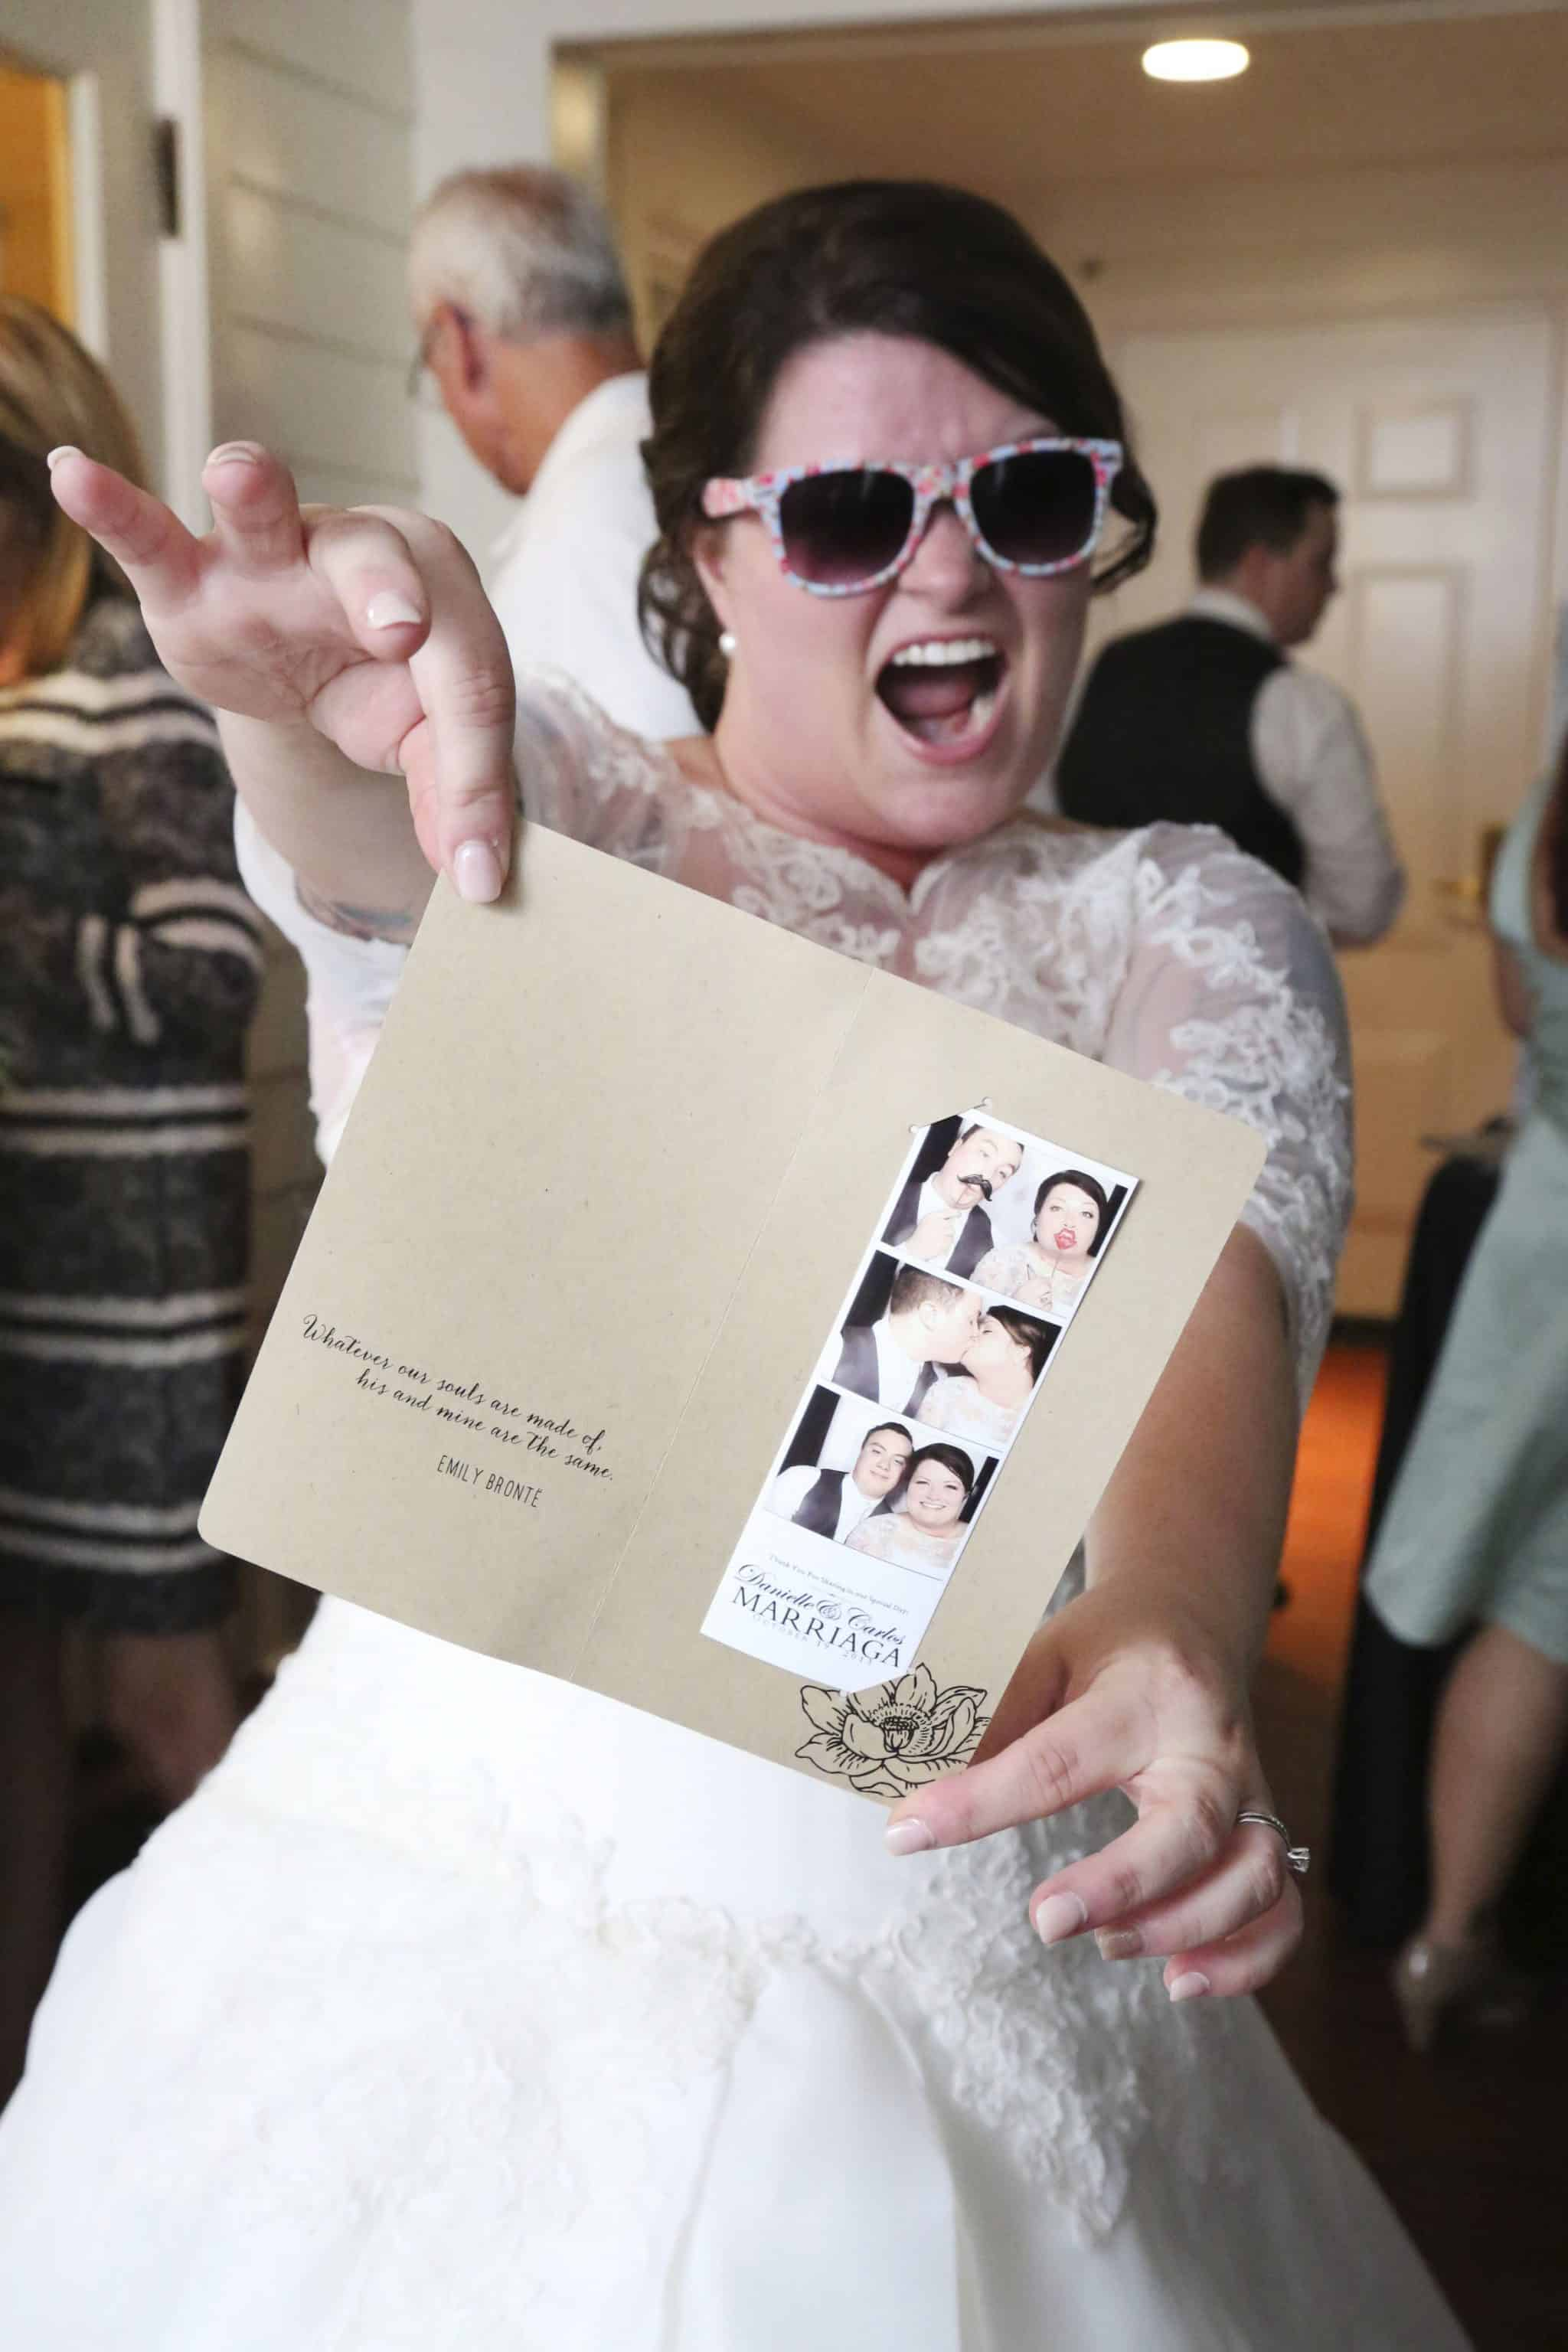 Photobooth Brides having fun with Our DJ Rocks